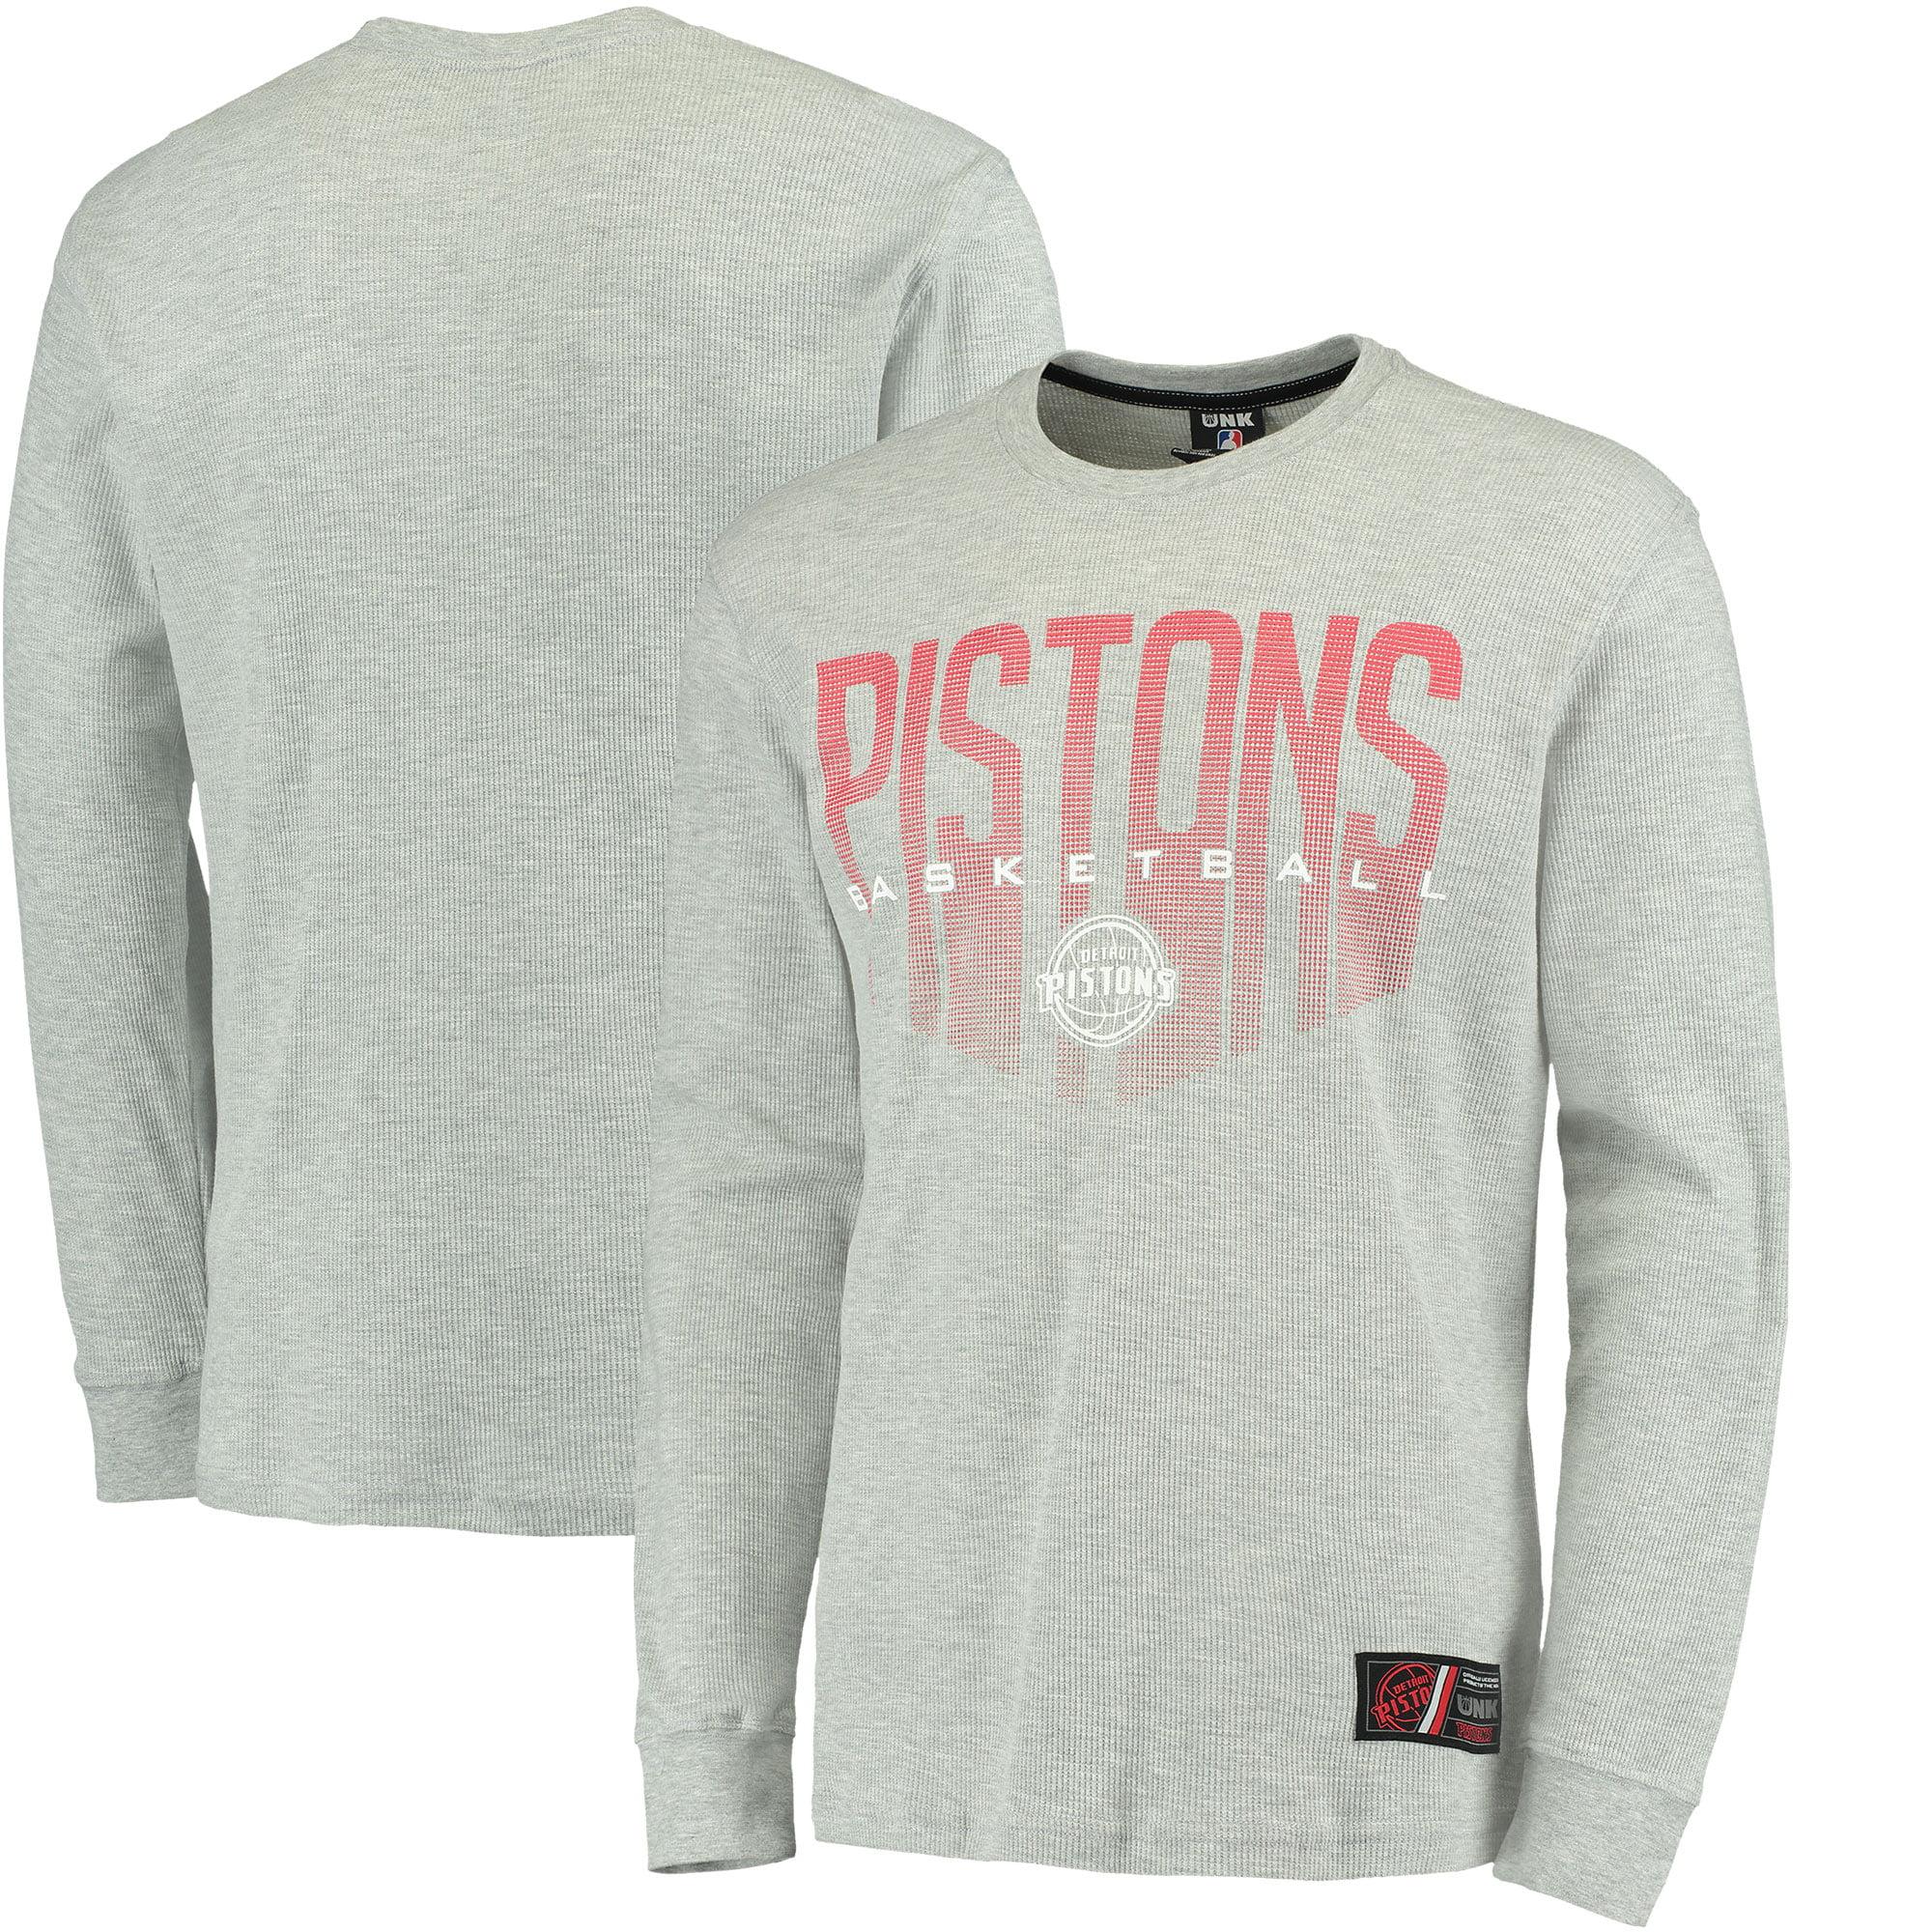 Detroit Pistons UNK Promo Core Long Sleeve Thermal T-Shirt - Gray